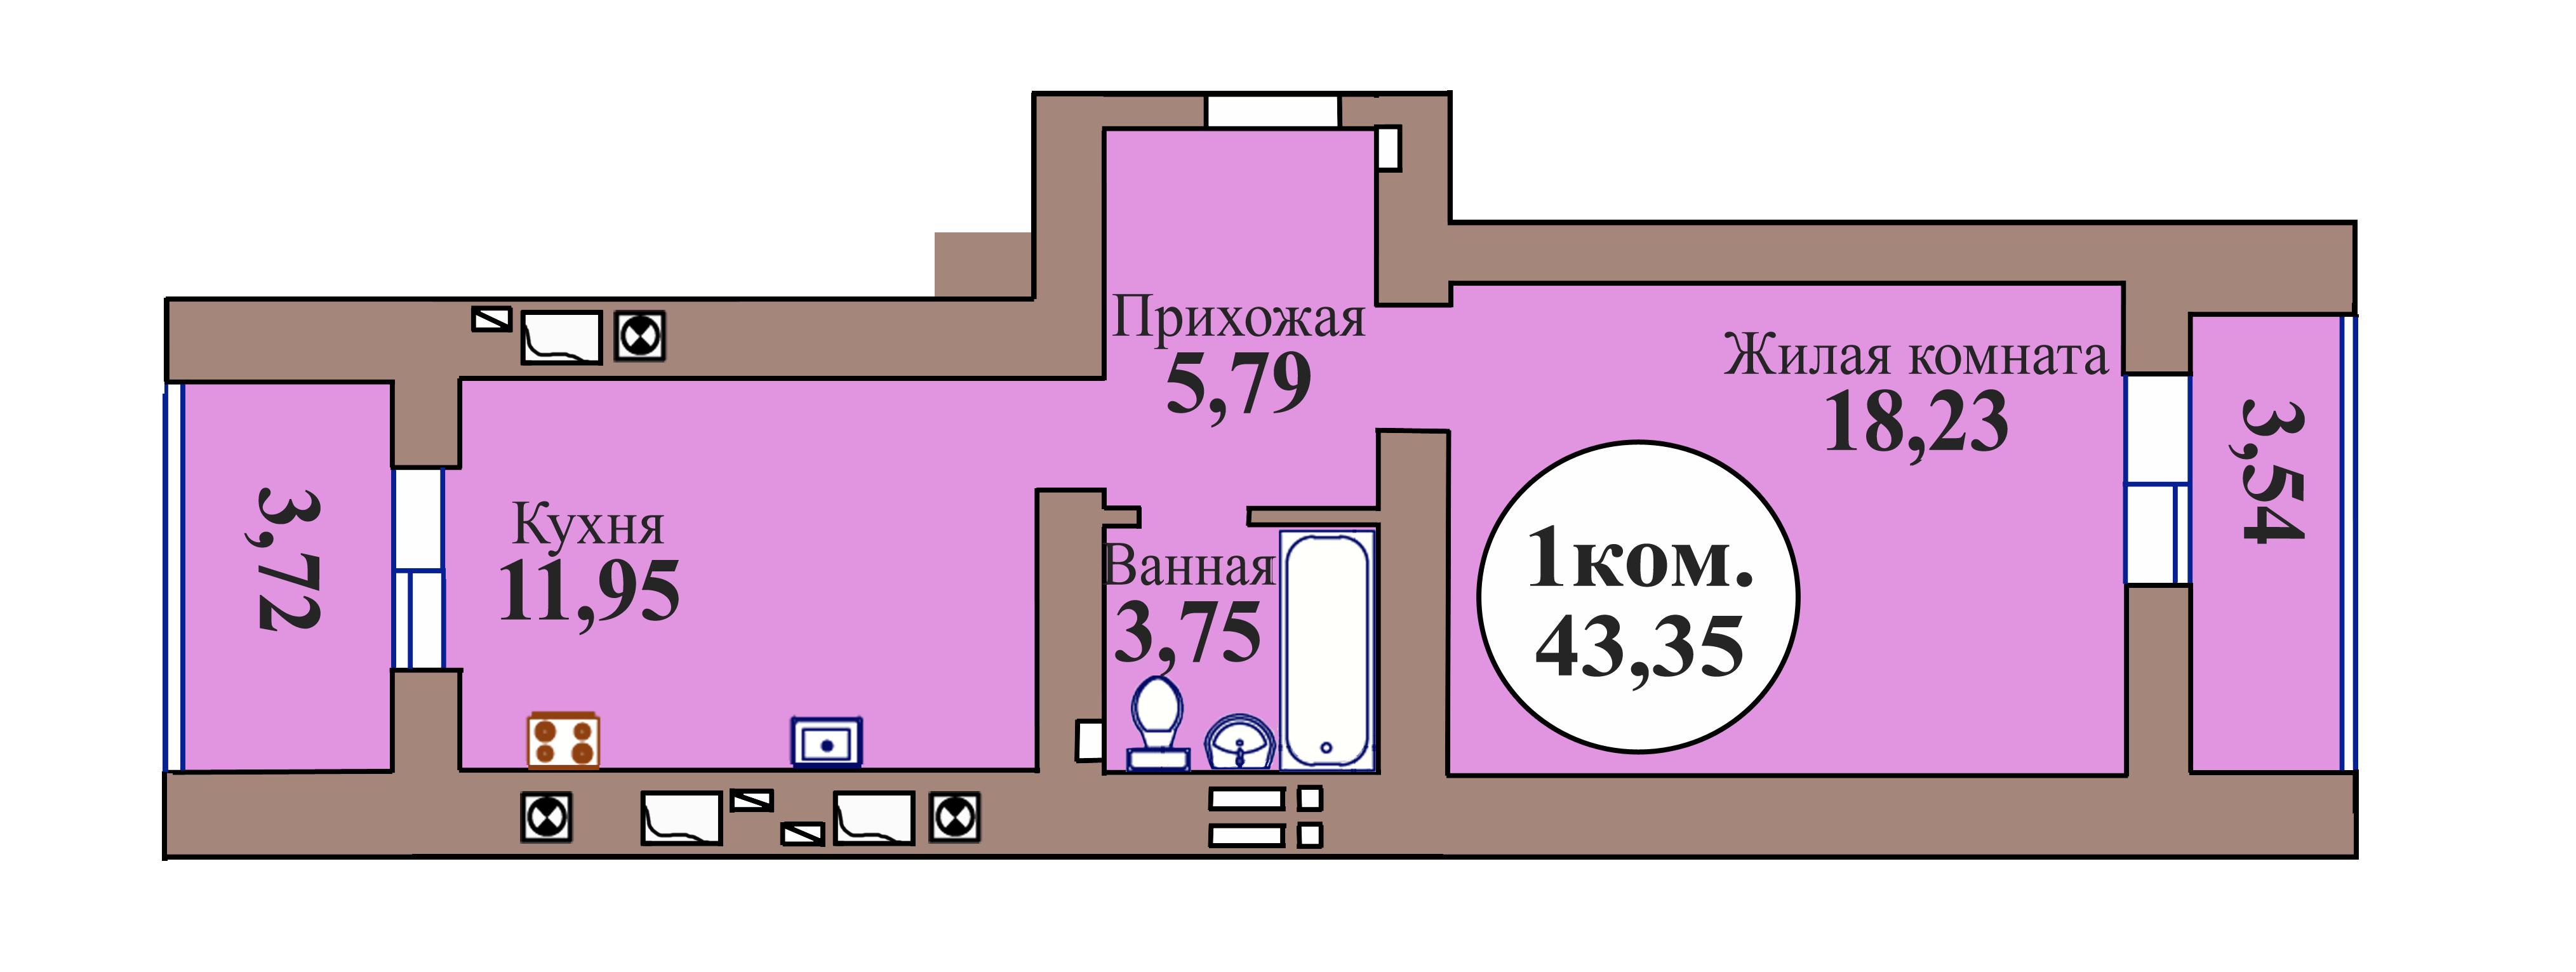 1-комн. кв. по пер. Калининградский, 5 кв. 66 в Калининграде